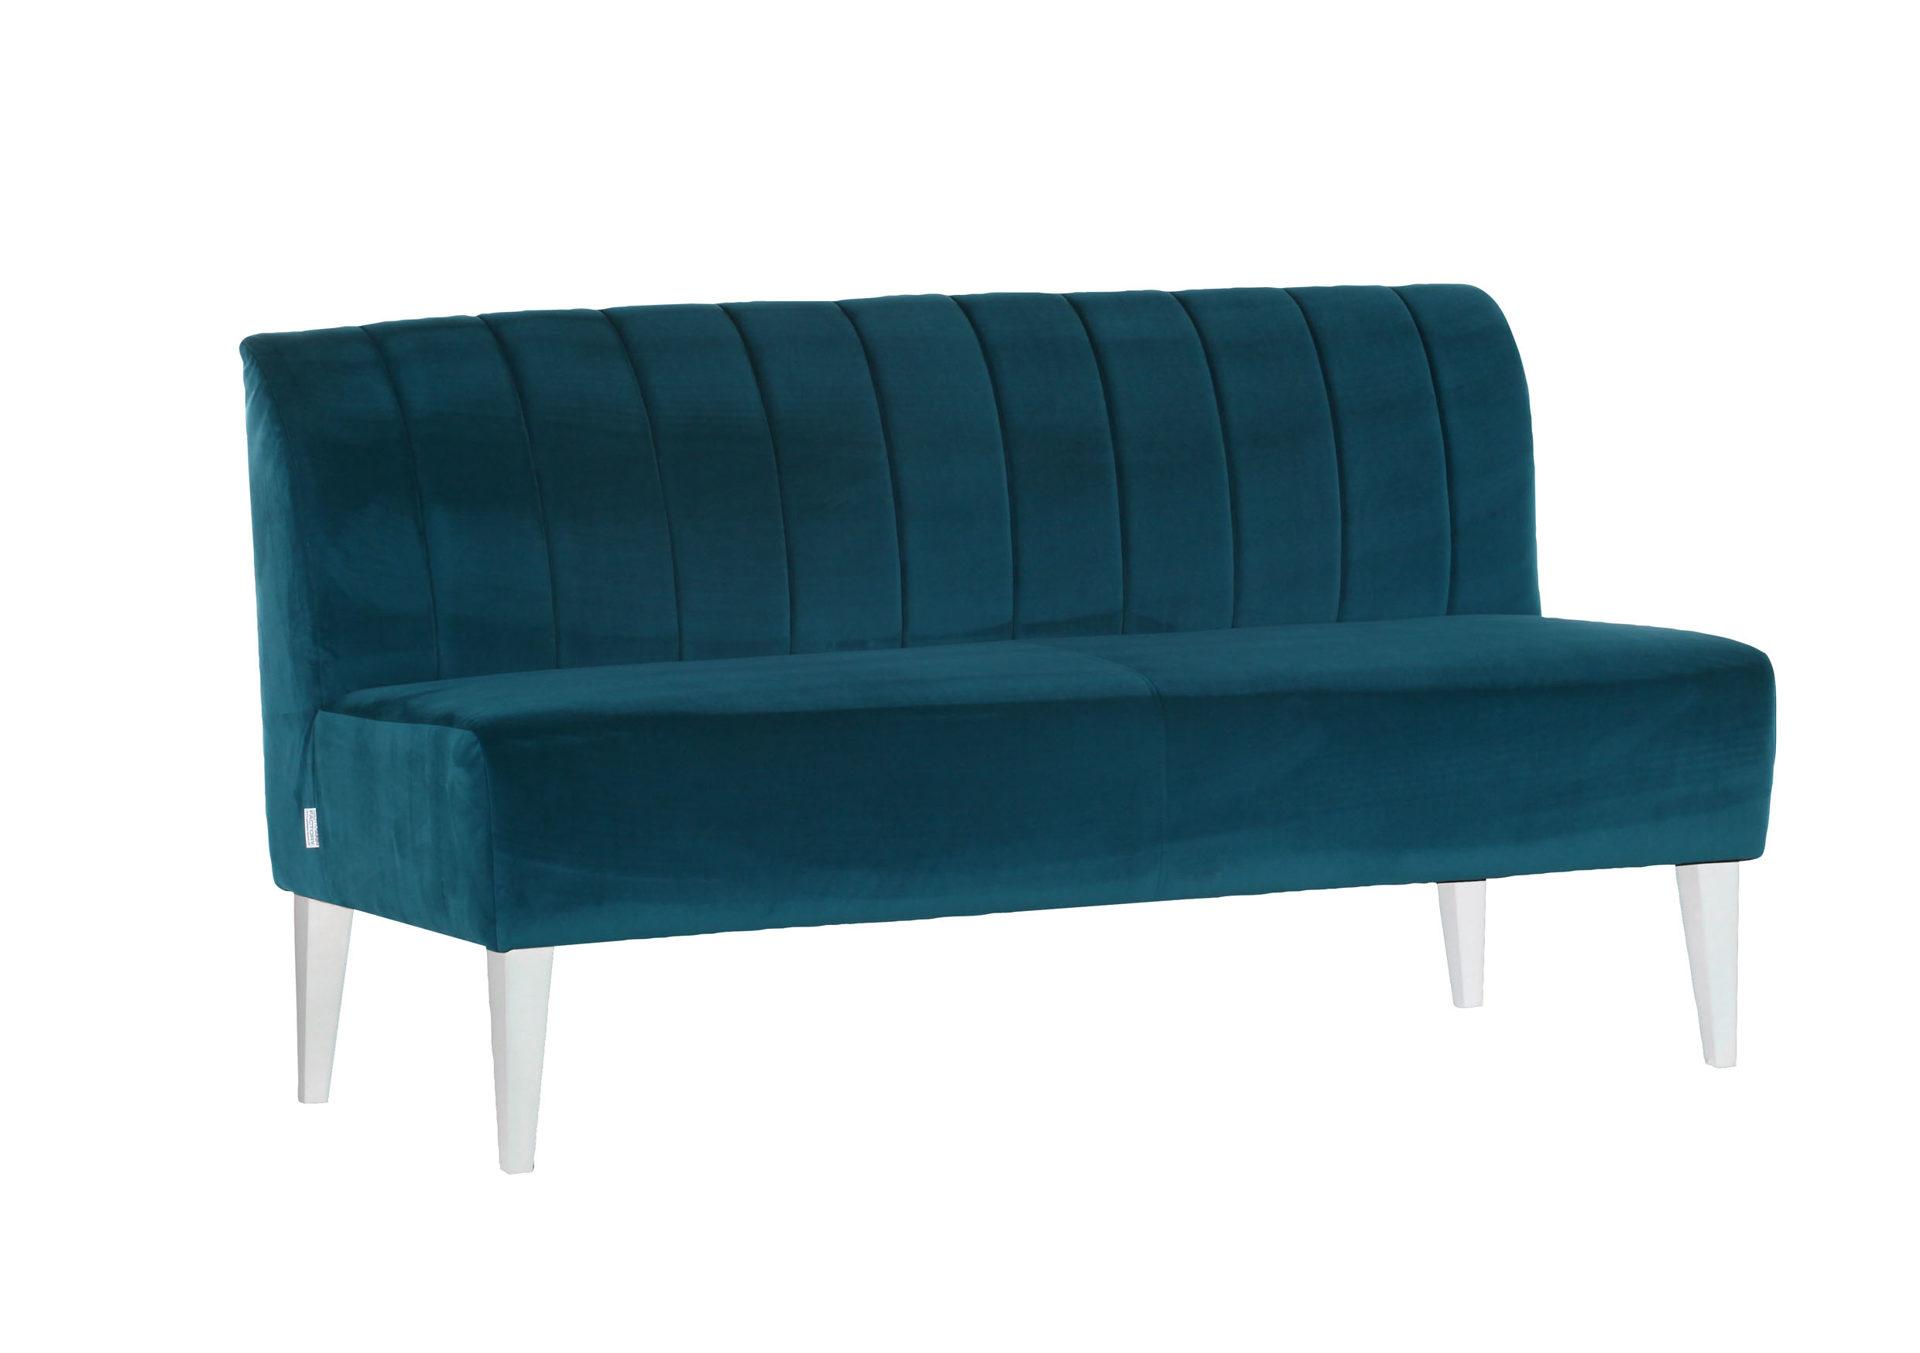 Sofa im Retro-Stil als Polstermöbel mit Flair, petrolfarbener Stoff ...